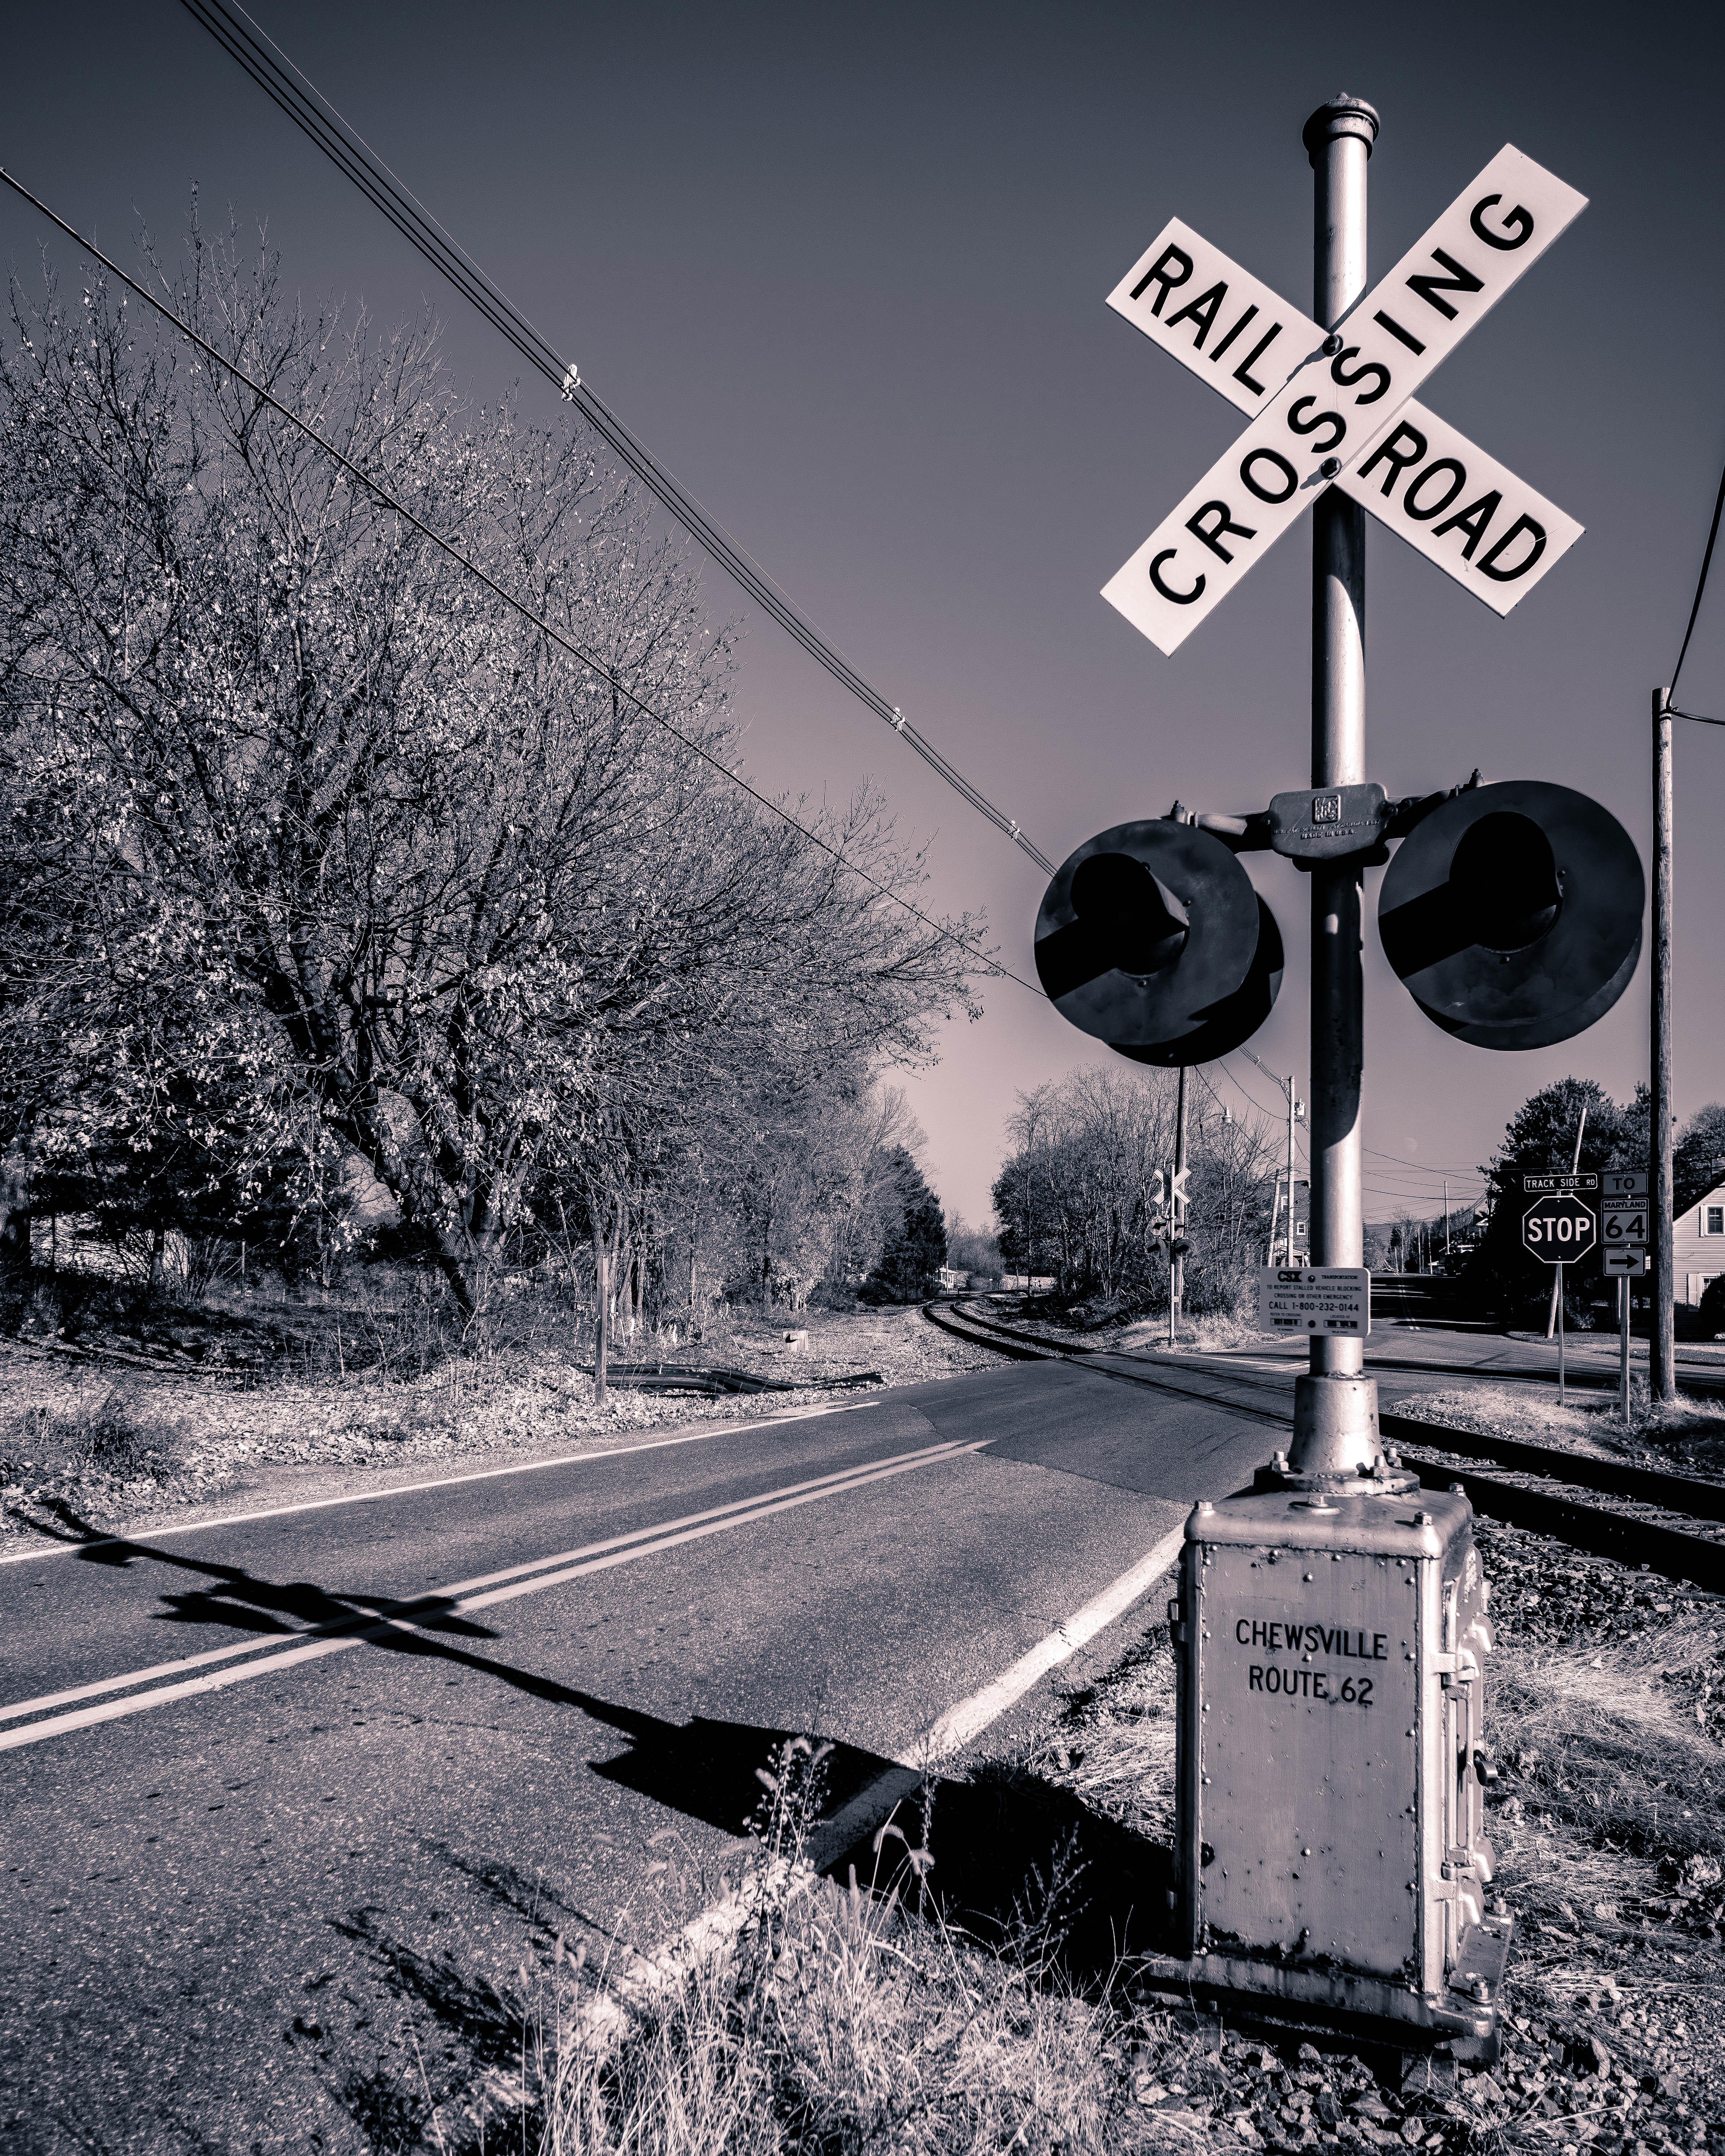 Chewsville Route 62